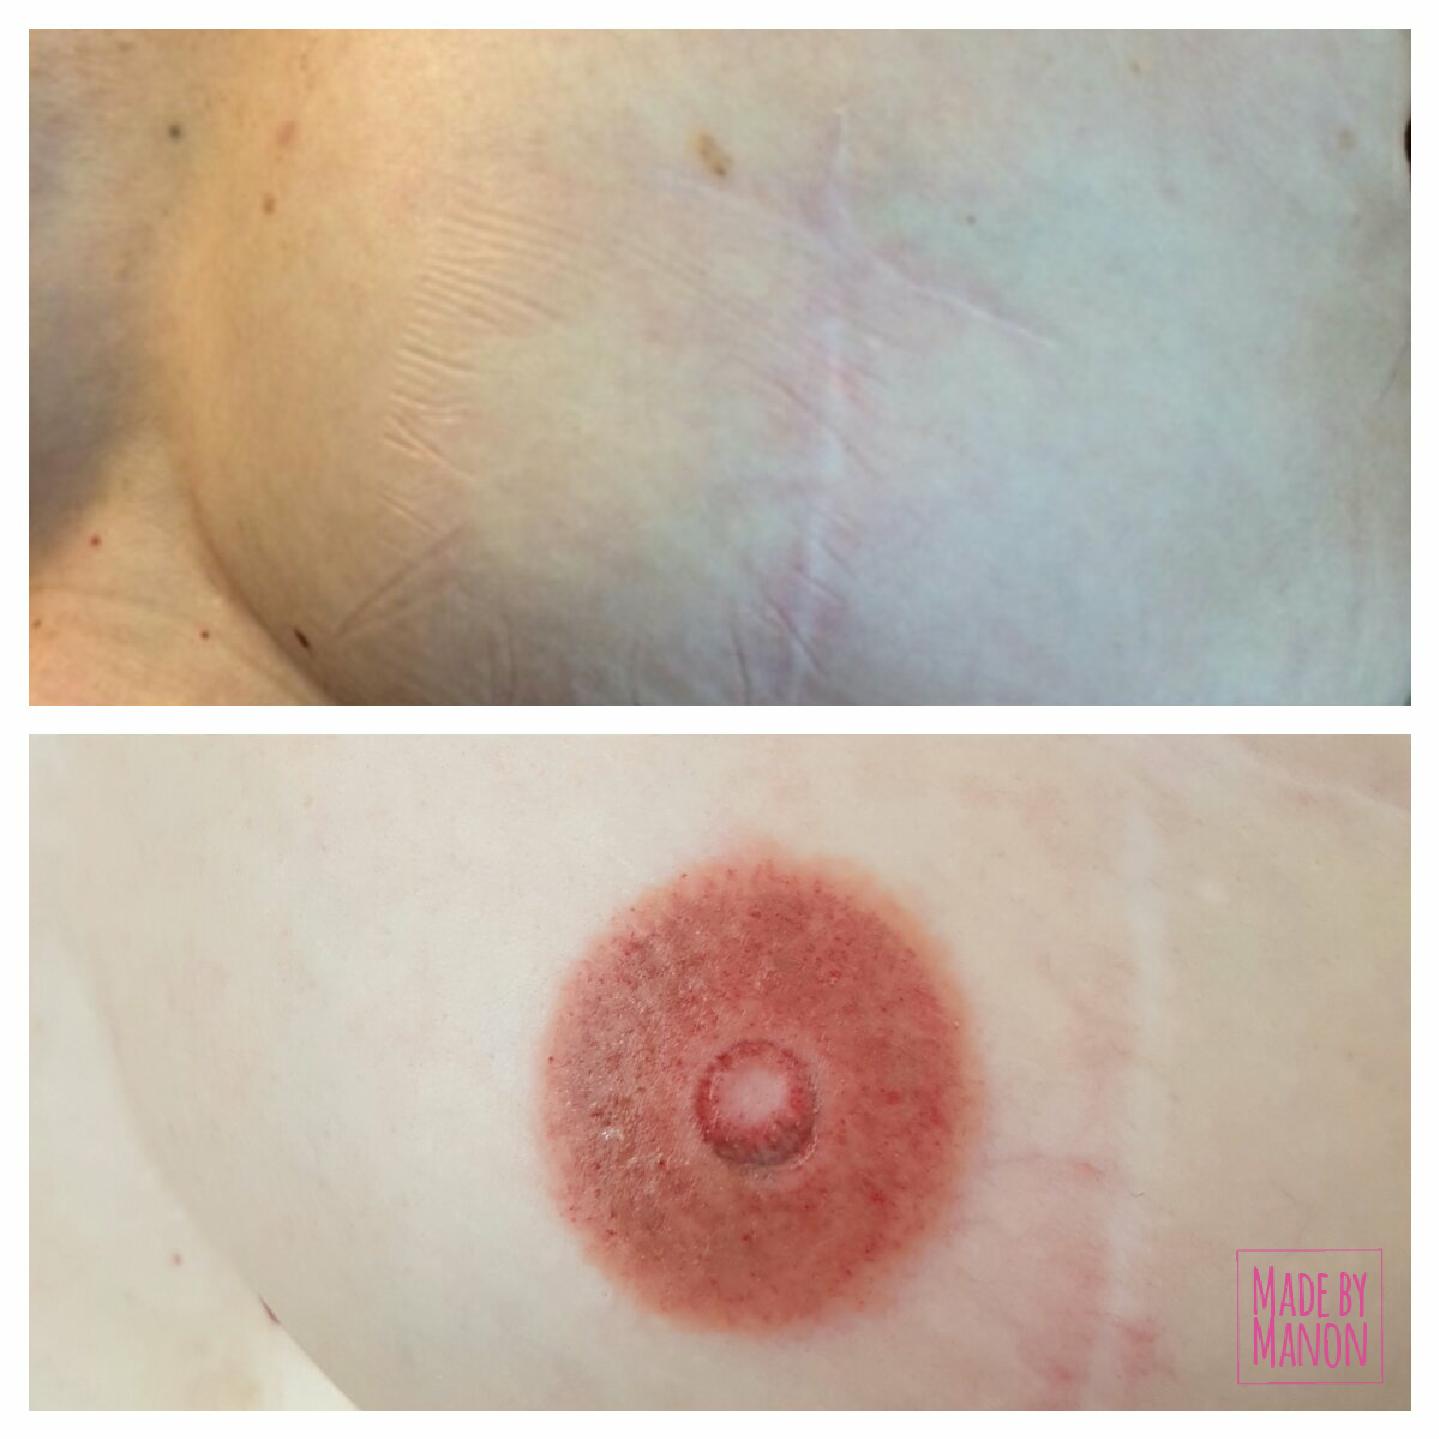 tepel borst permanente make up medische pigmentatie amsterdam haarlem alopecia